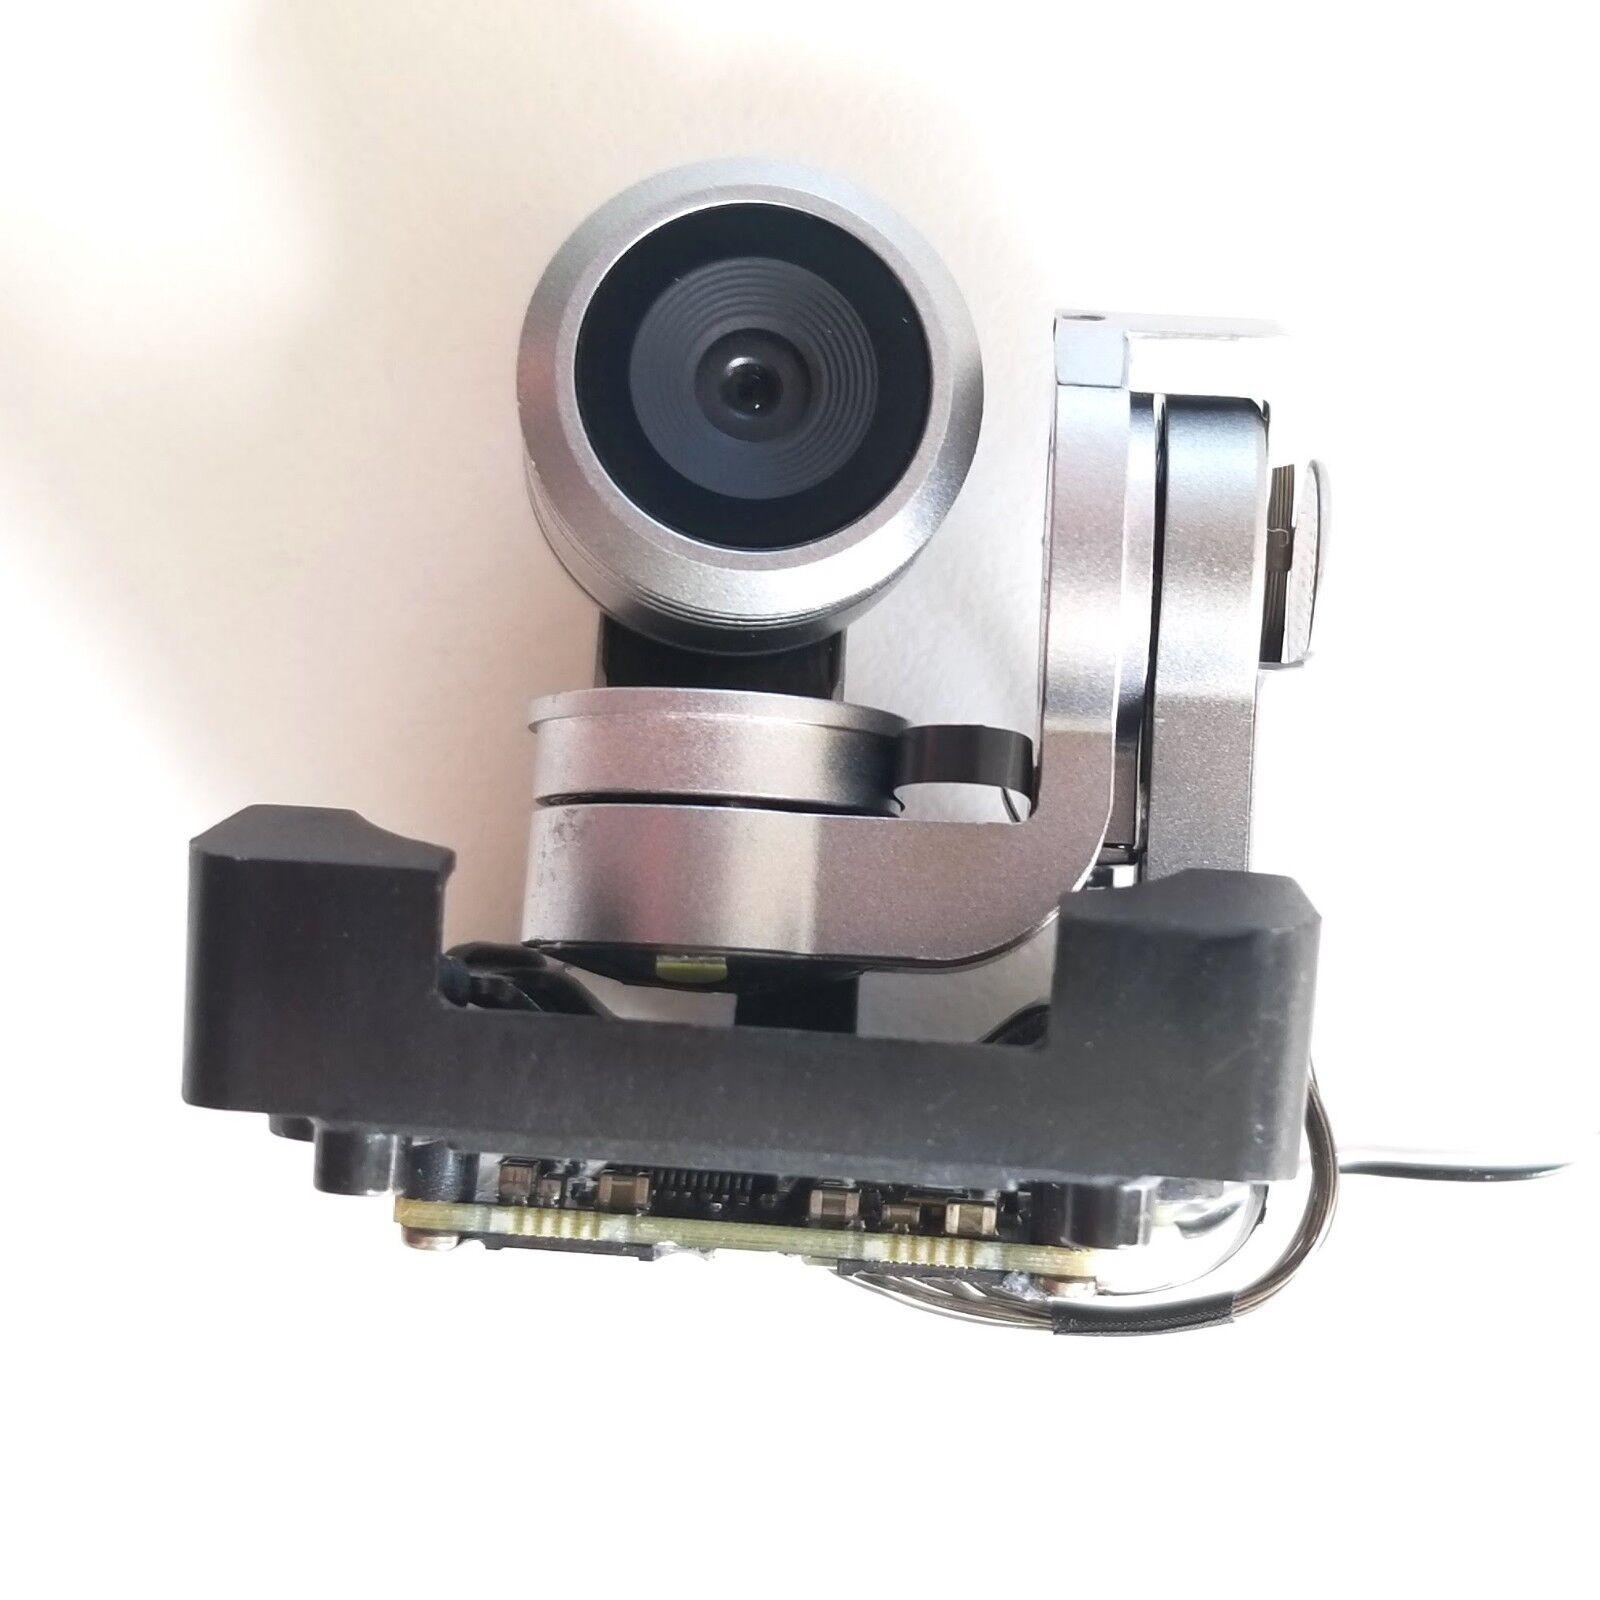 DJI Mavic Pro Gimbal Camera Assembly, 4k Video Camera & Gimbal (Tested, Working)